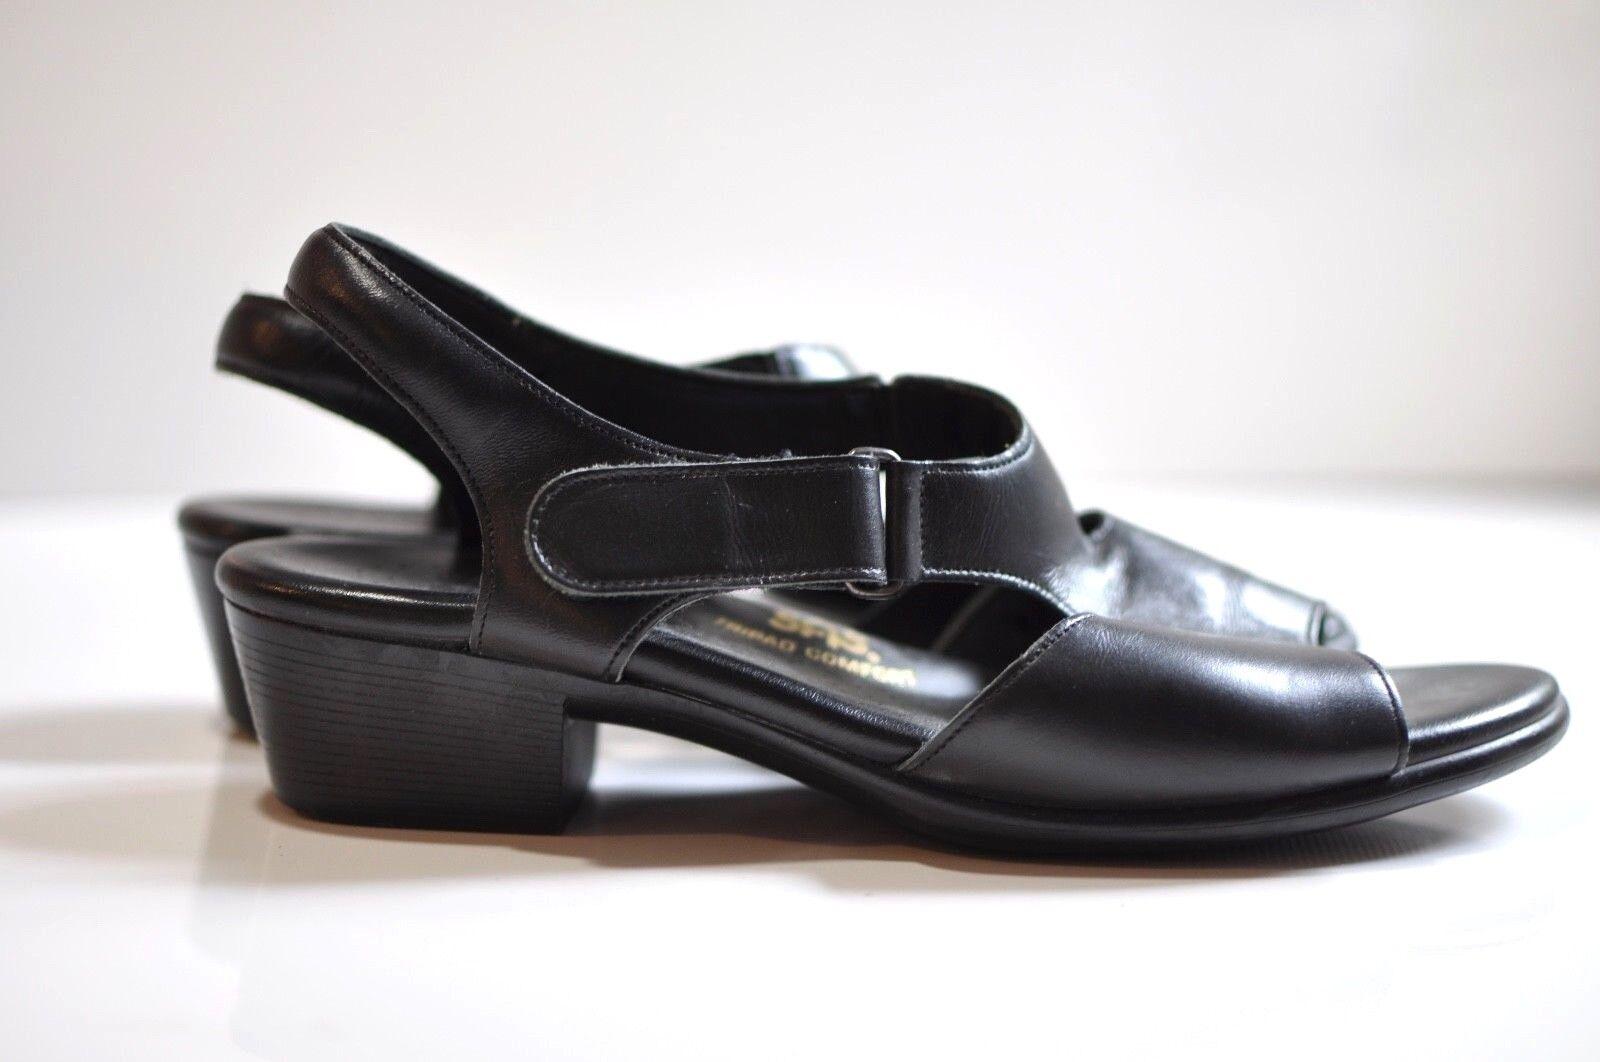 SAS 9.5 Tripad Comfort black leather strap sandals women's 9.5 SAS N made in USA 0130fa